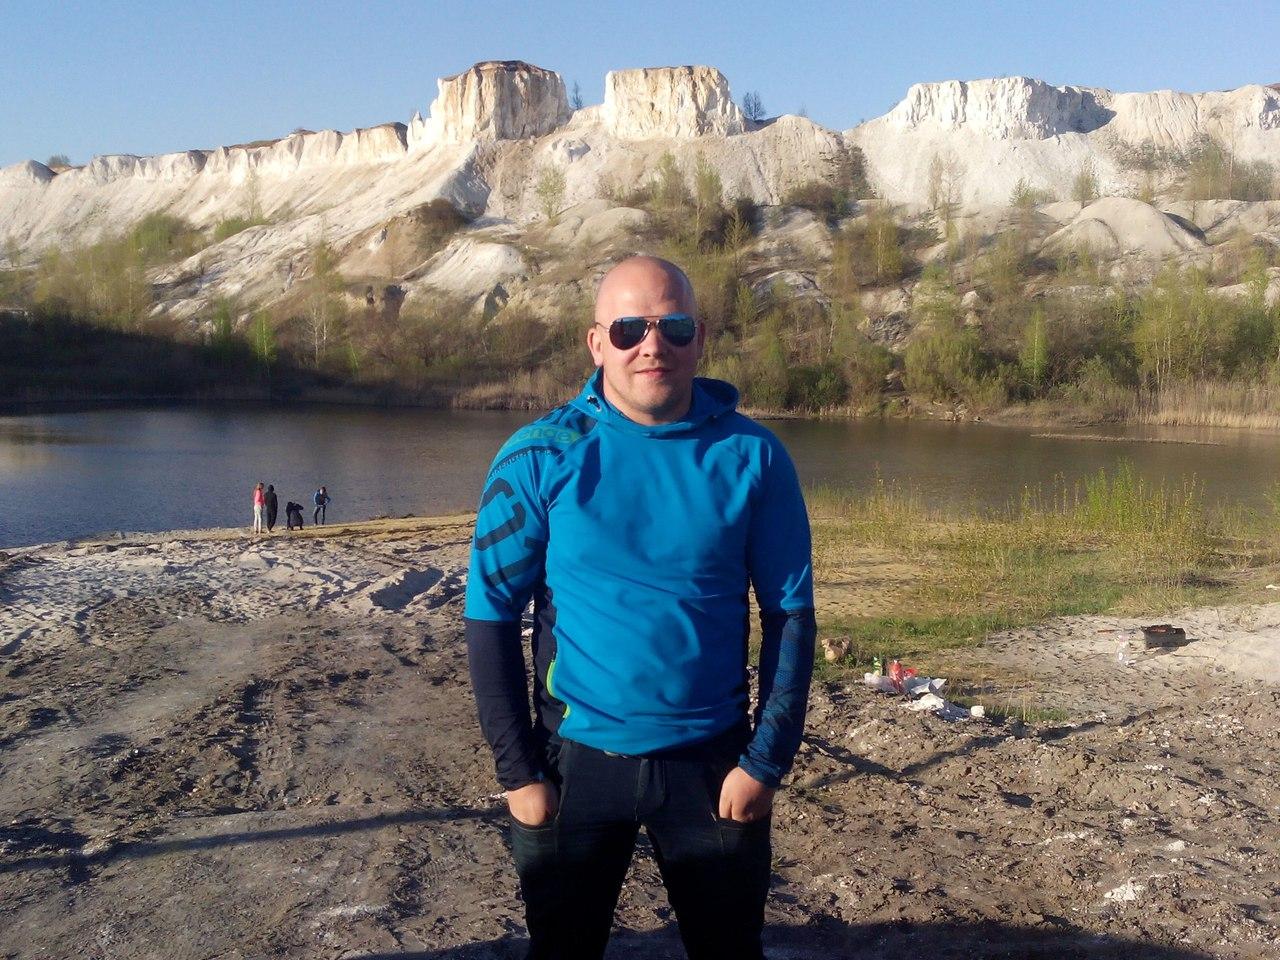 Сергей Коломоец, Белгород - фото №1